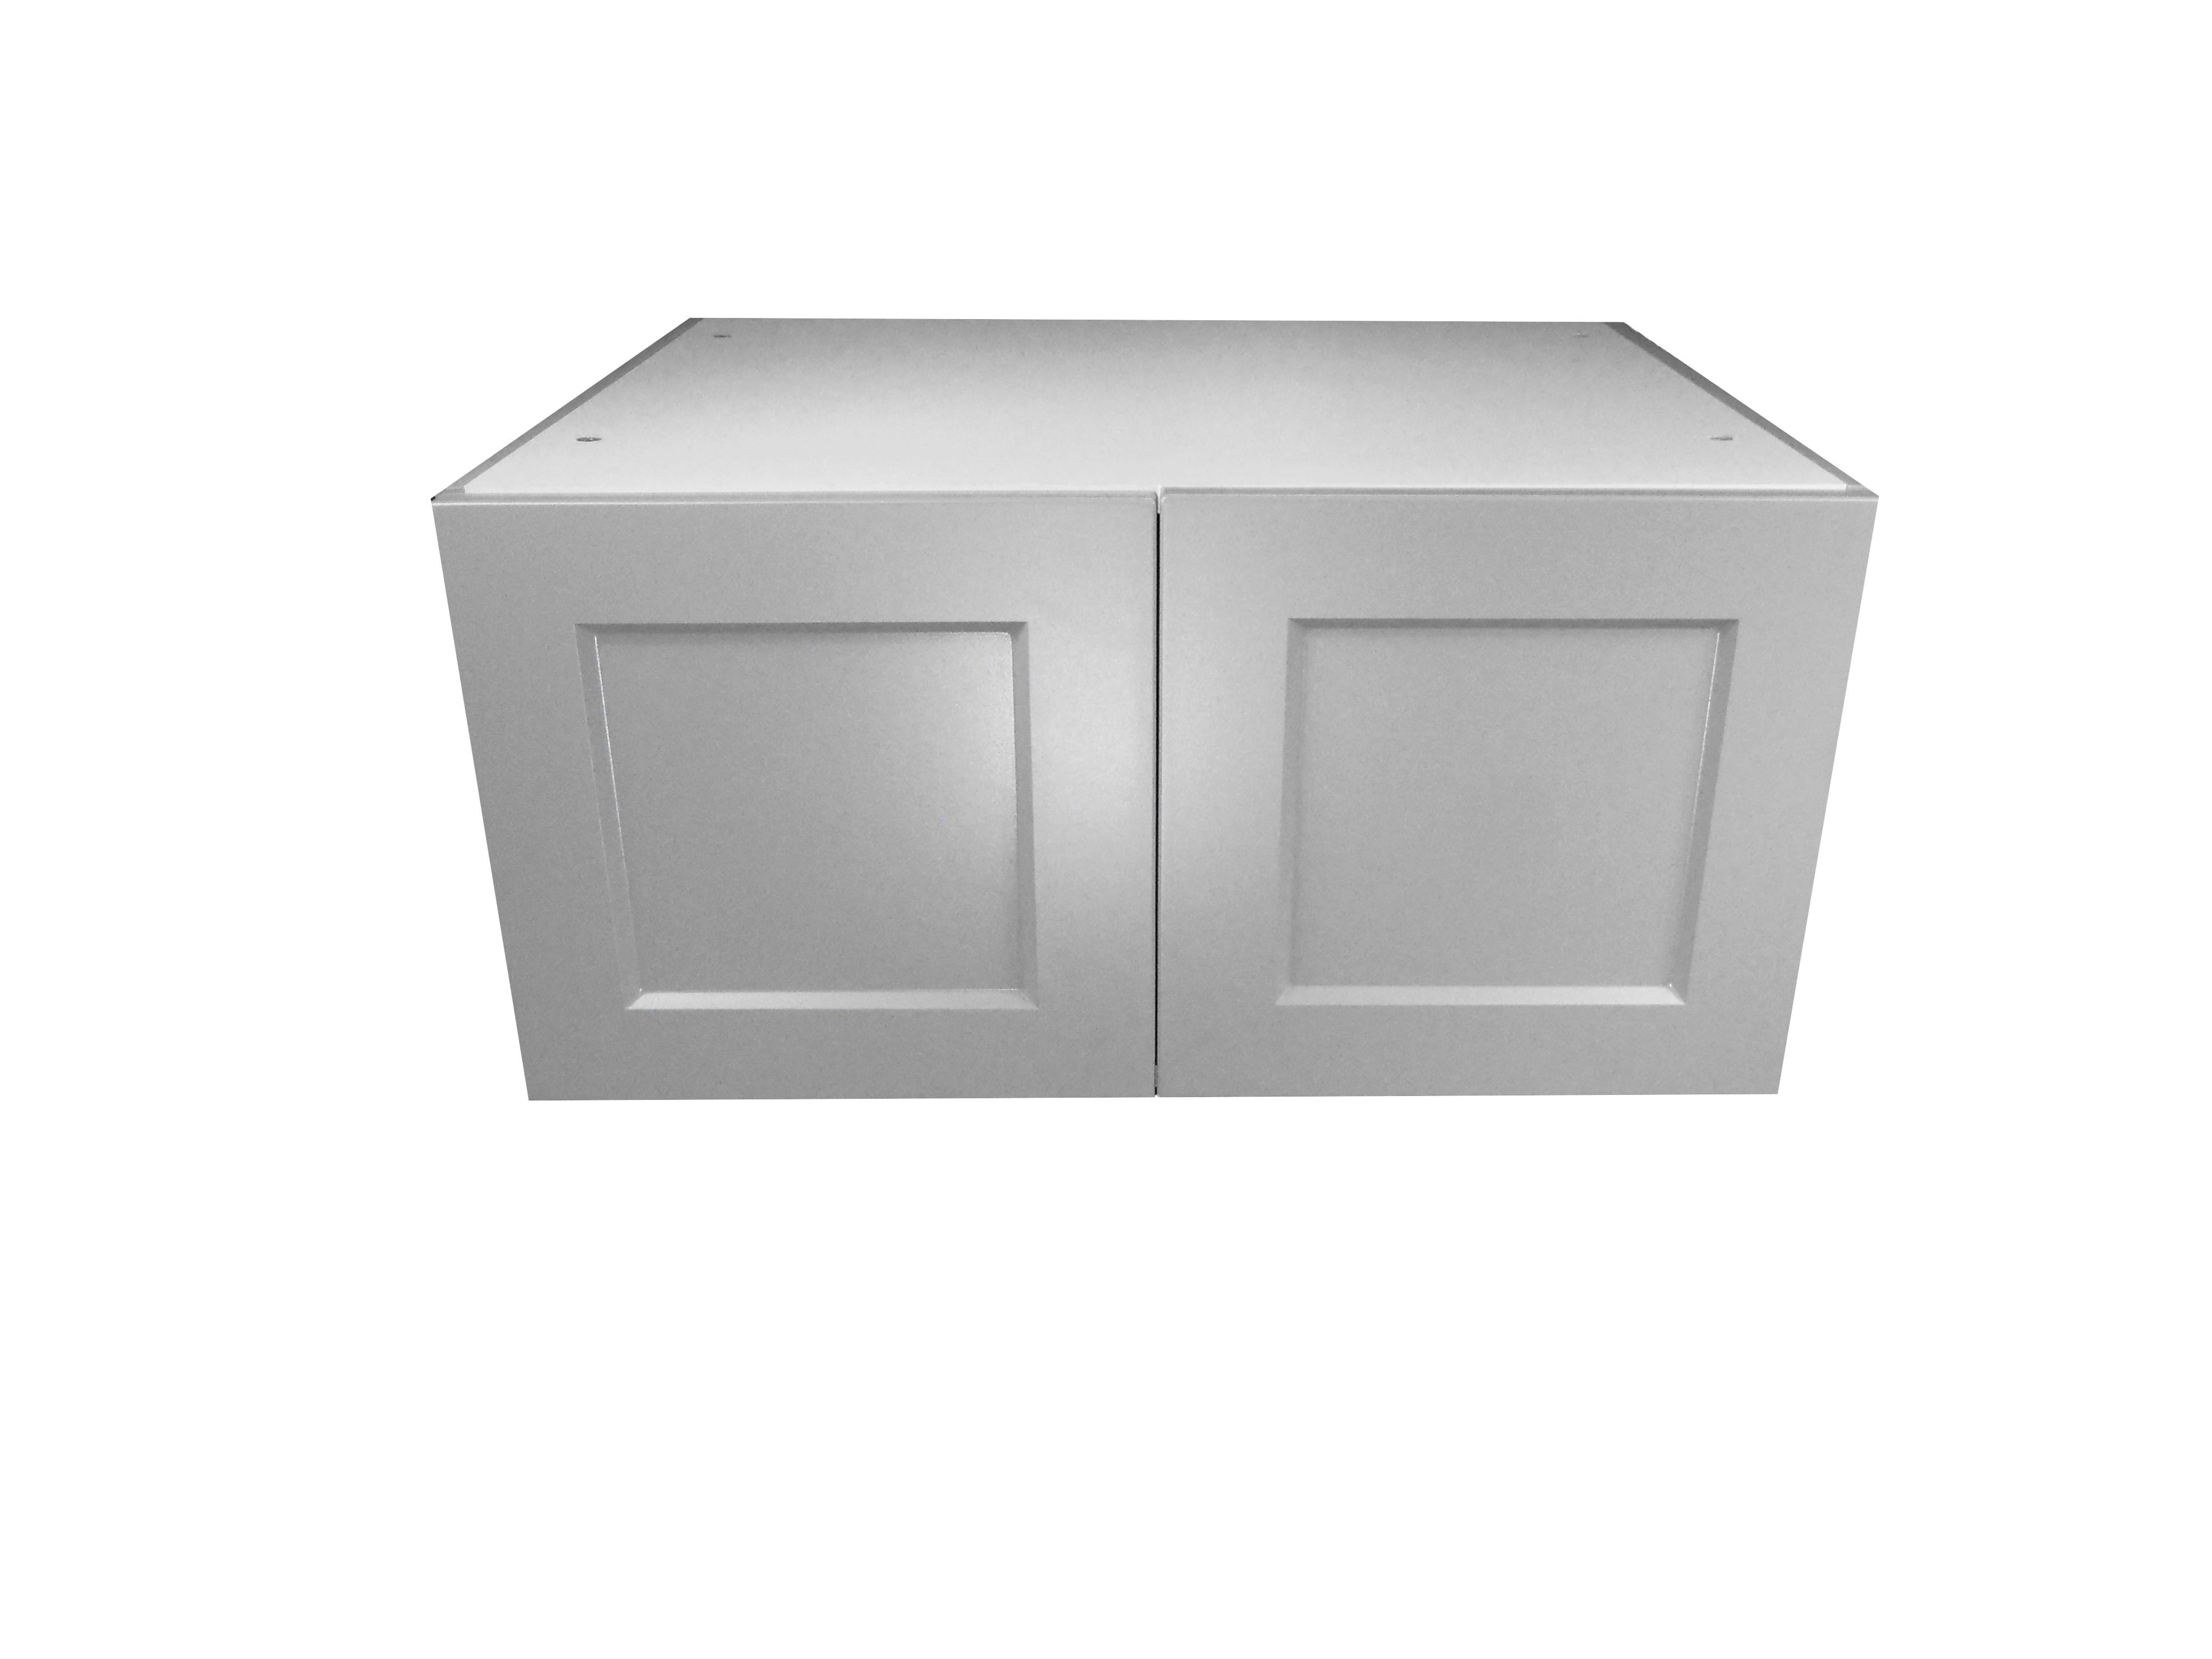 Deep Appliance Wall Cabinet / Whistler Grey / Flat Panel Grey / 36x15x24 Whistler Grey 0